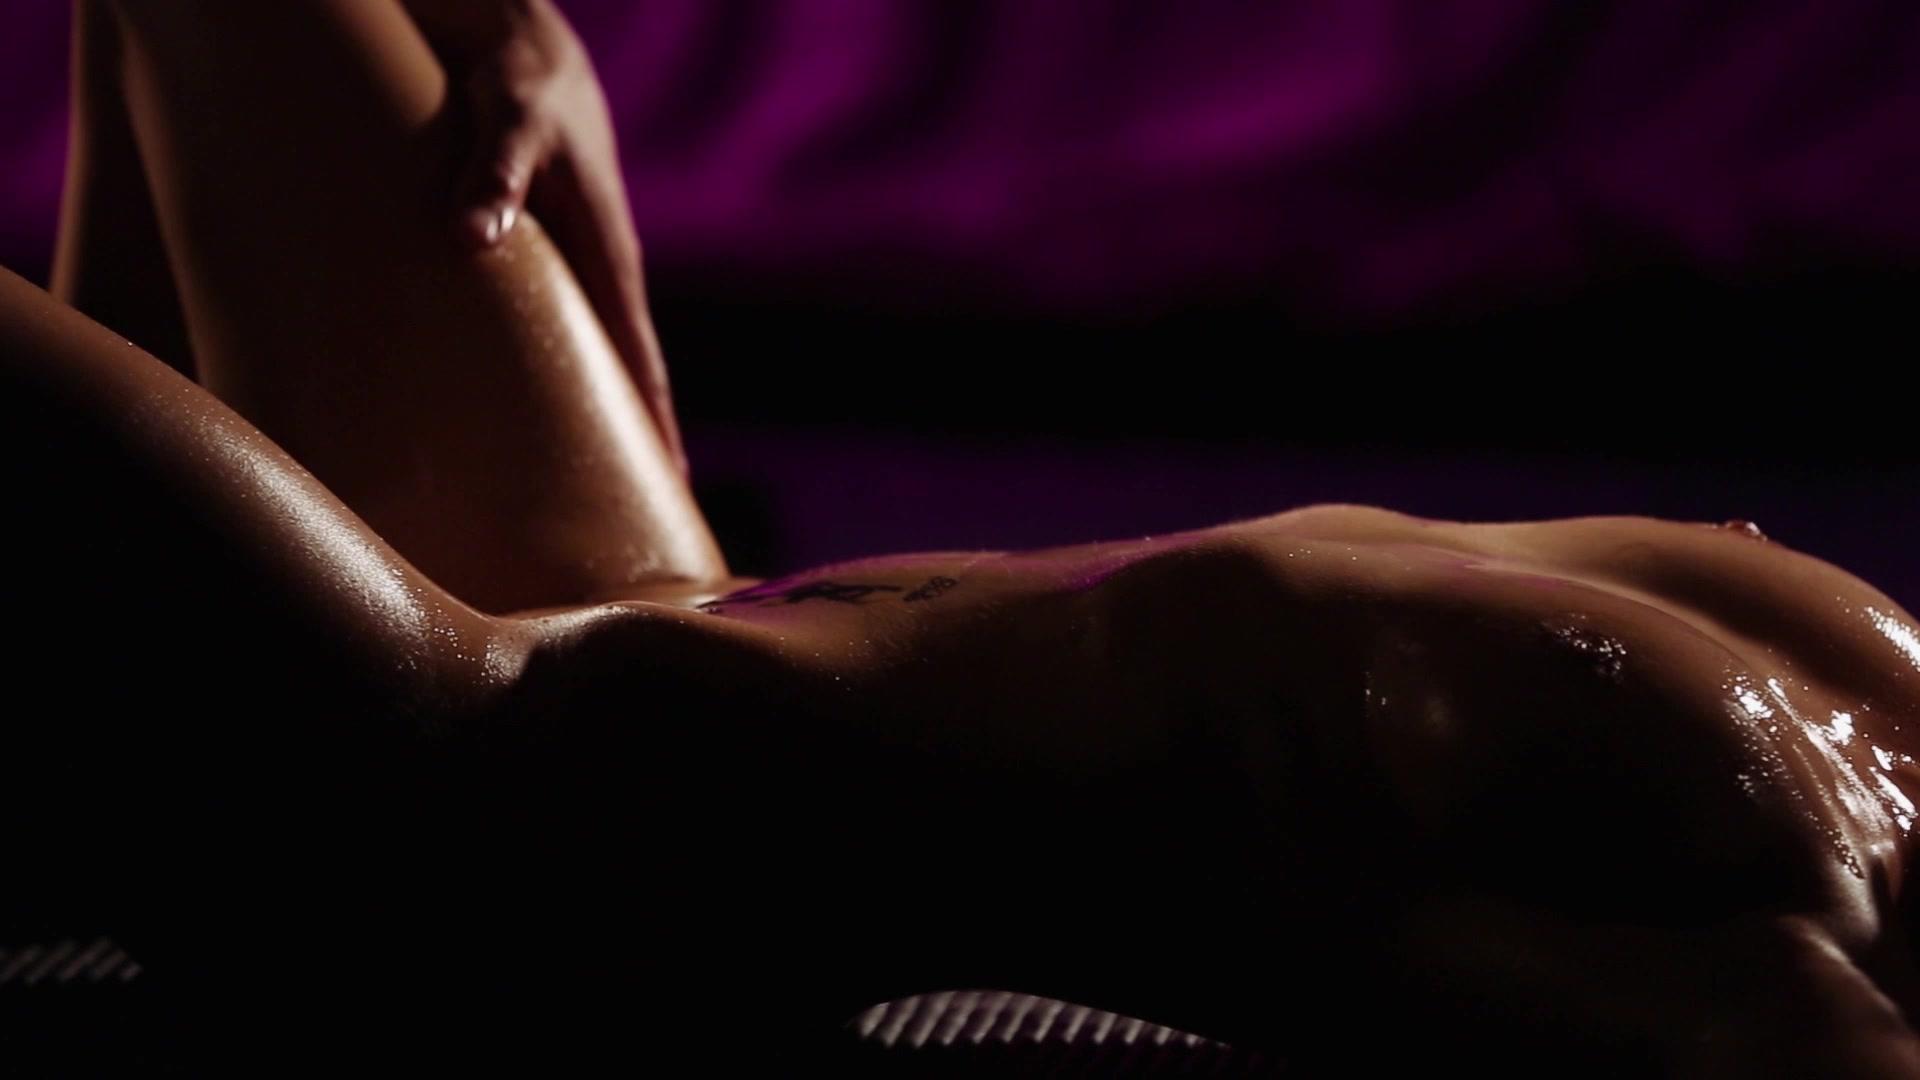 ass-gallery-chicago-suburbs-erotic-massage-naked-codi-girls